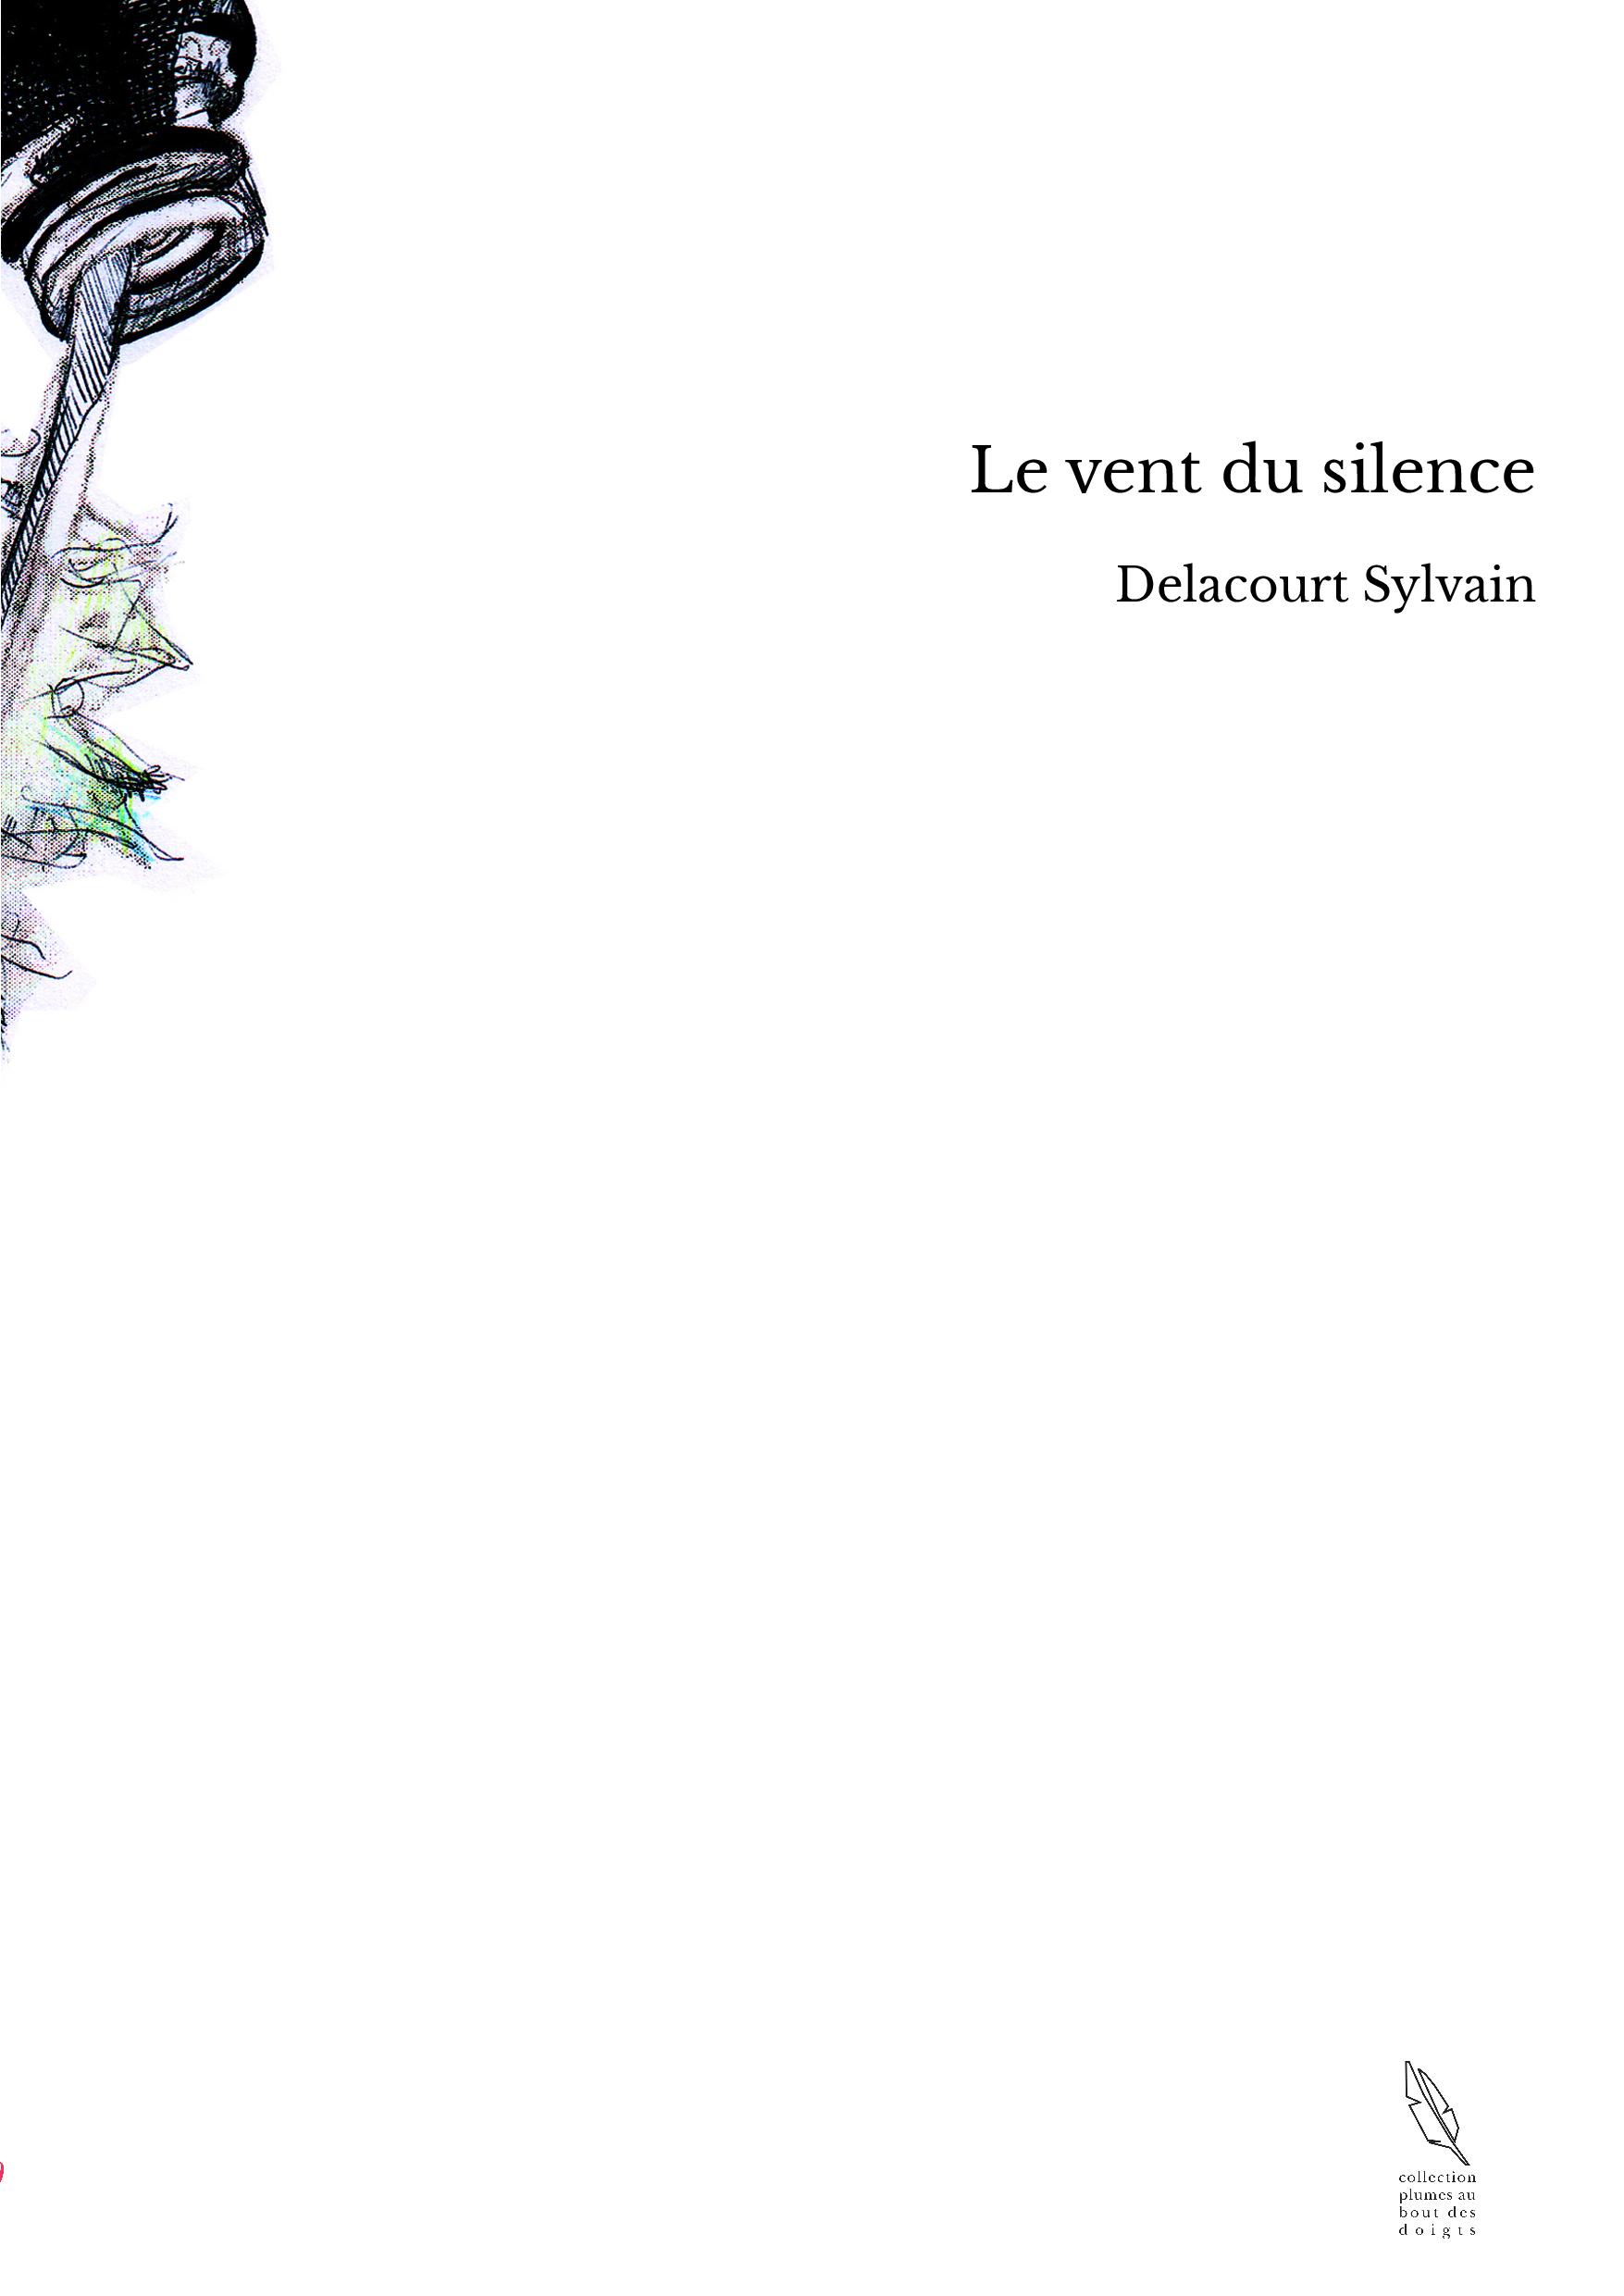 Le vent du silence